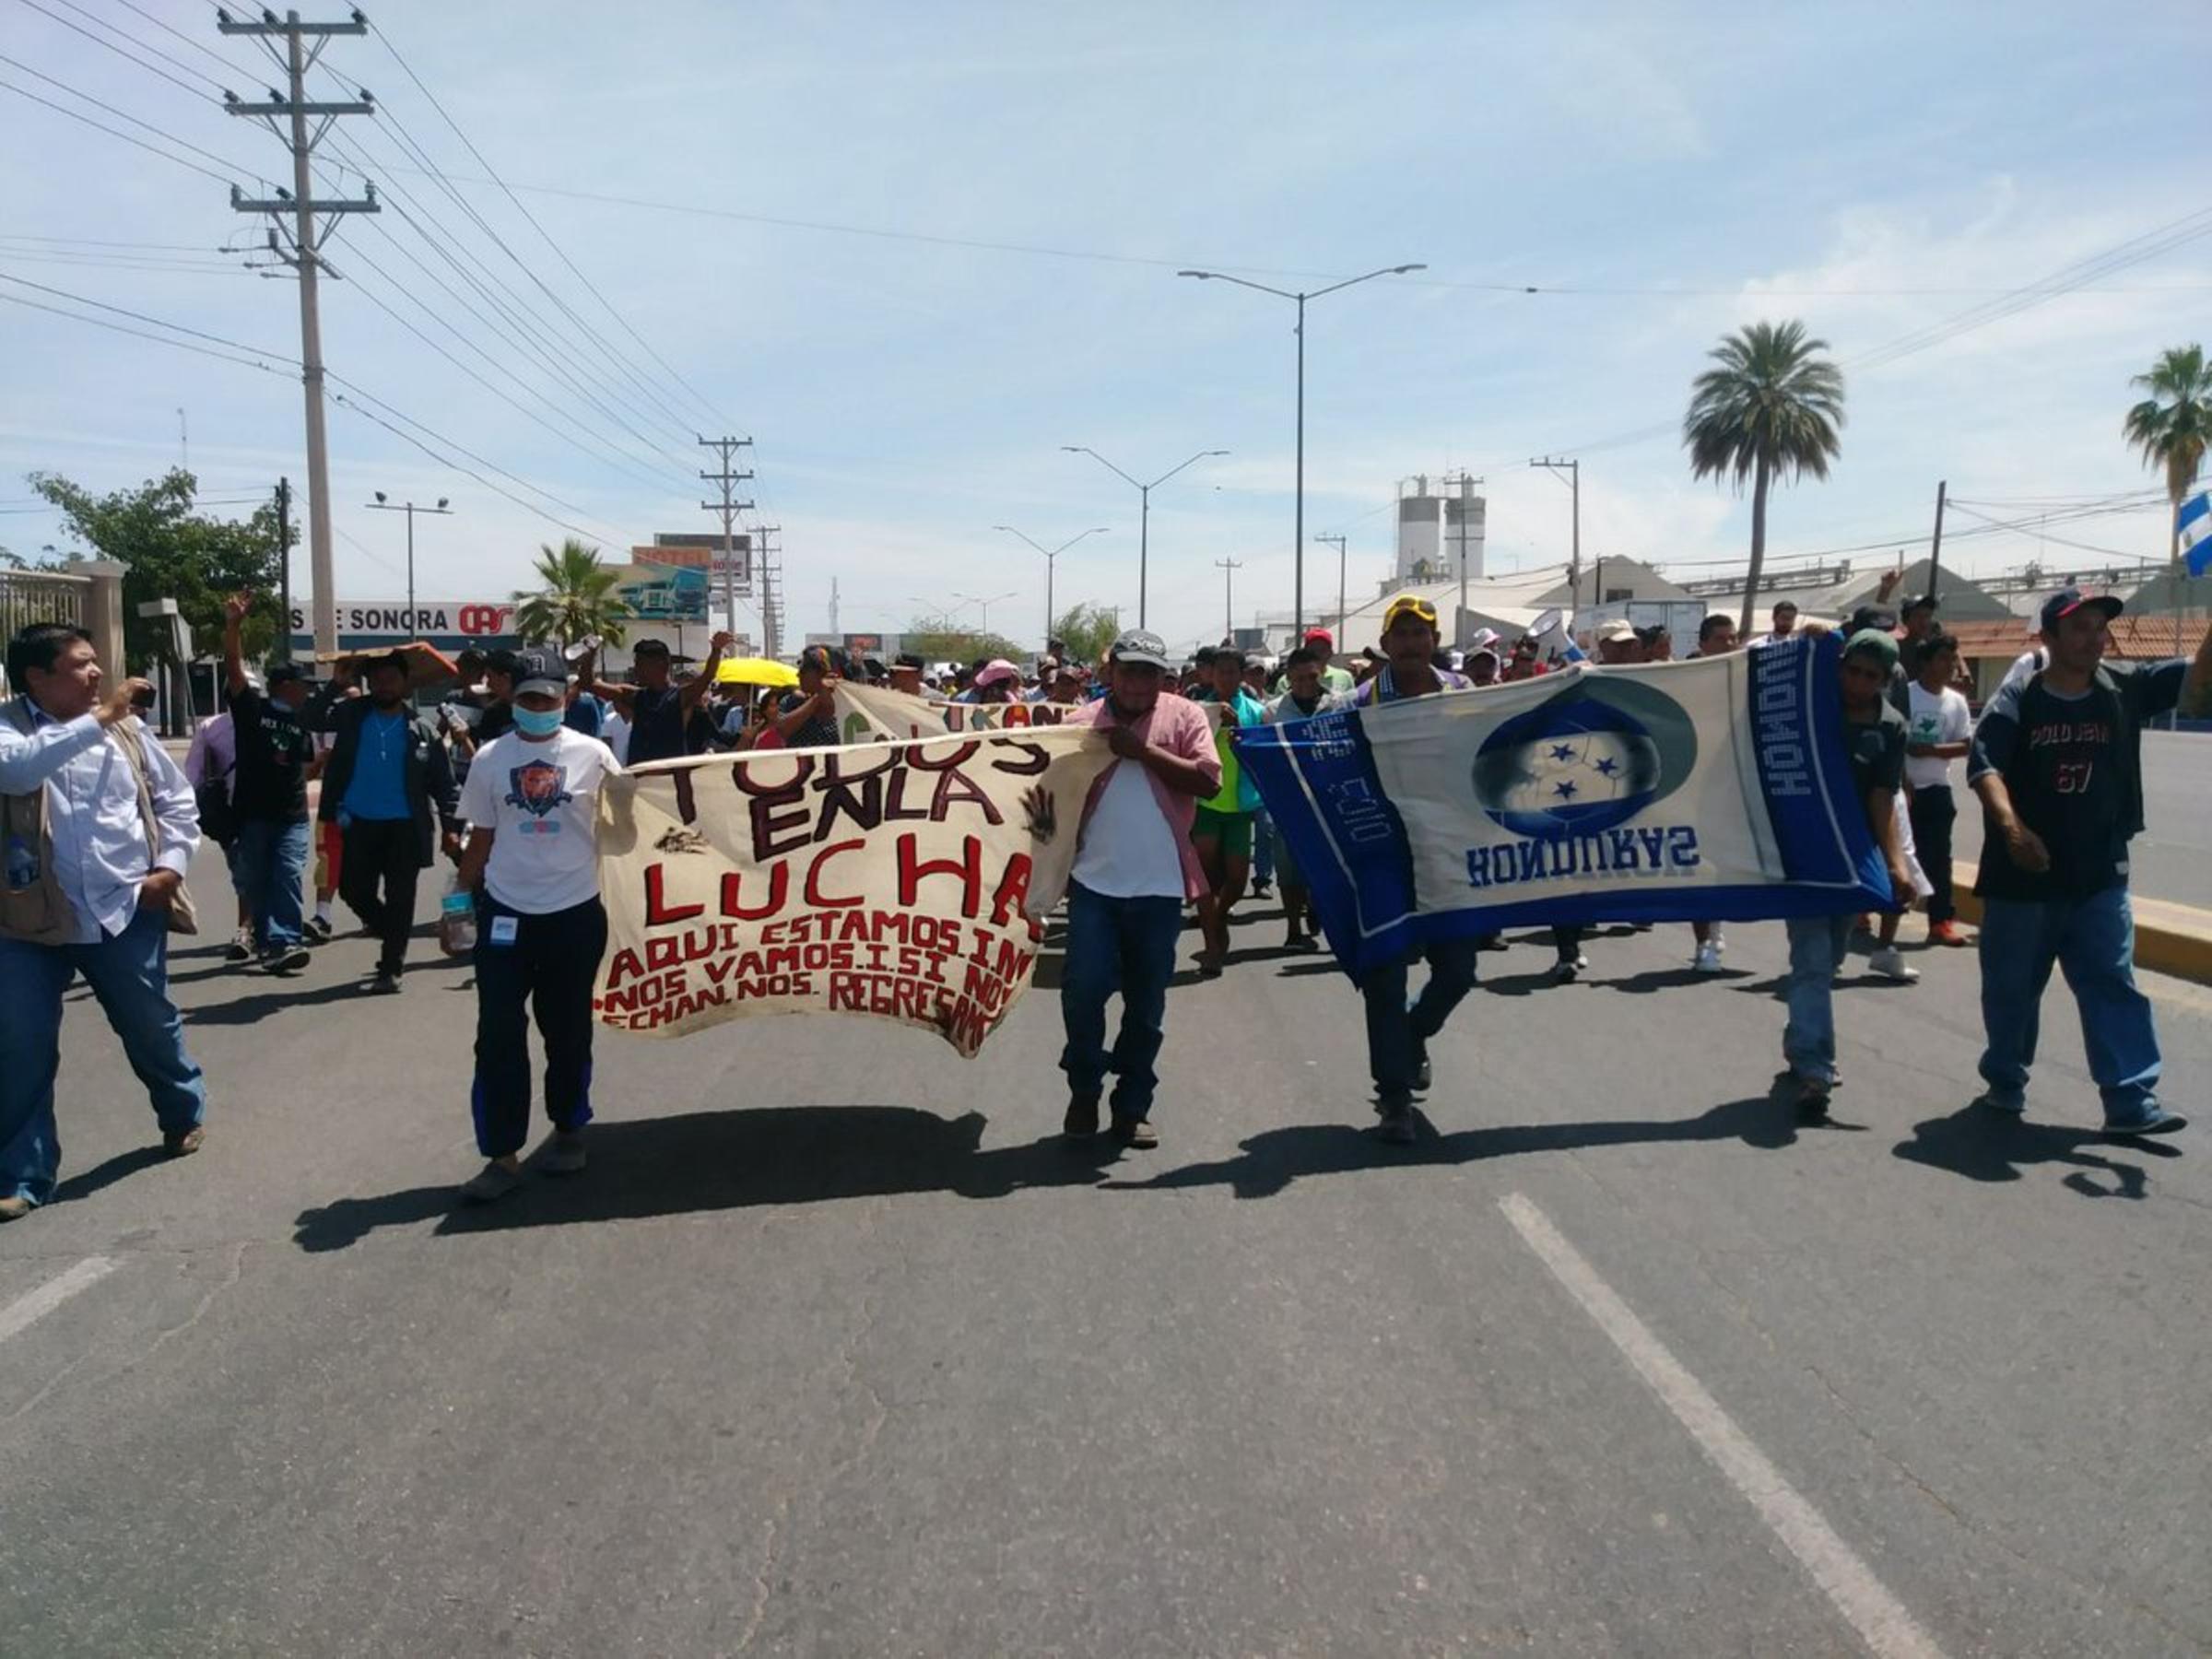 Caravana de migrantes prepara un cruce masivo a Estados Unidos